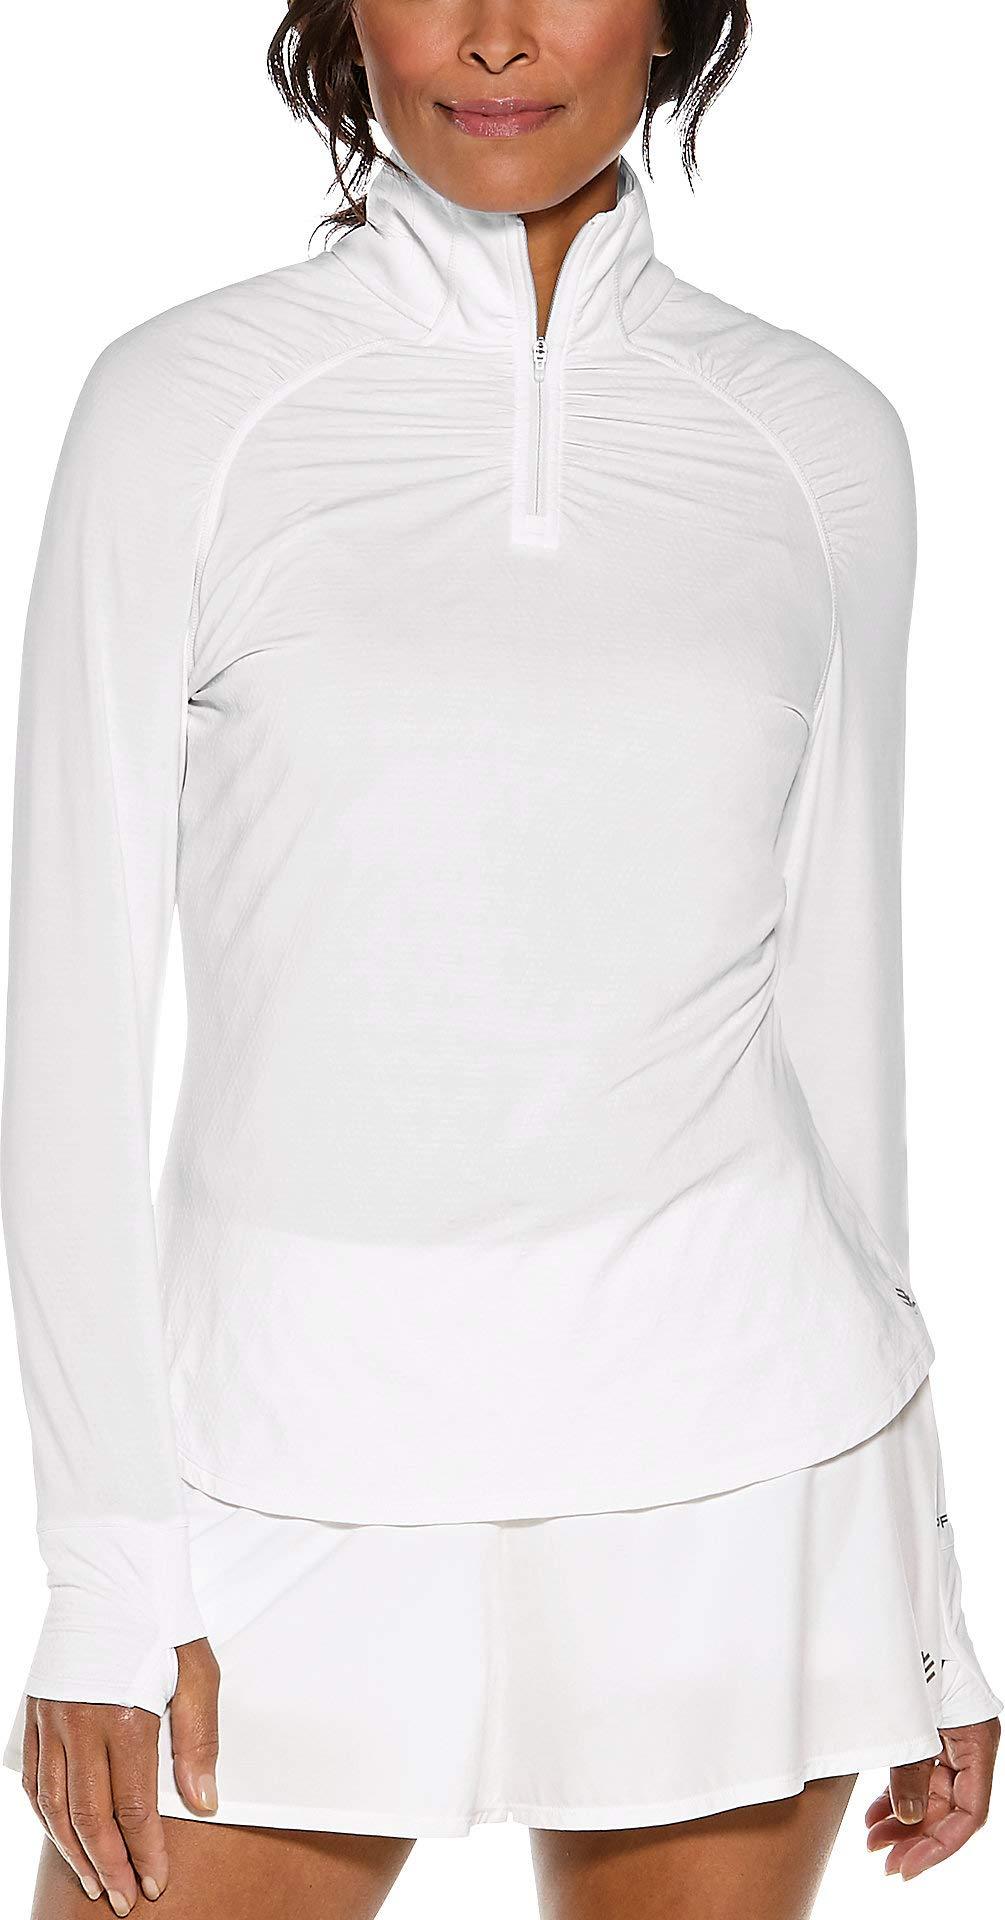 Coolibar UPF 50+ Women's Arabella Quarter-Zip - Sun Protective (X-Large- White Jacquard)